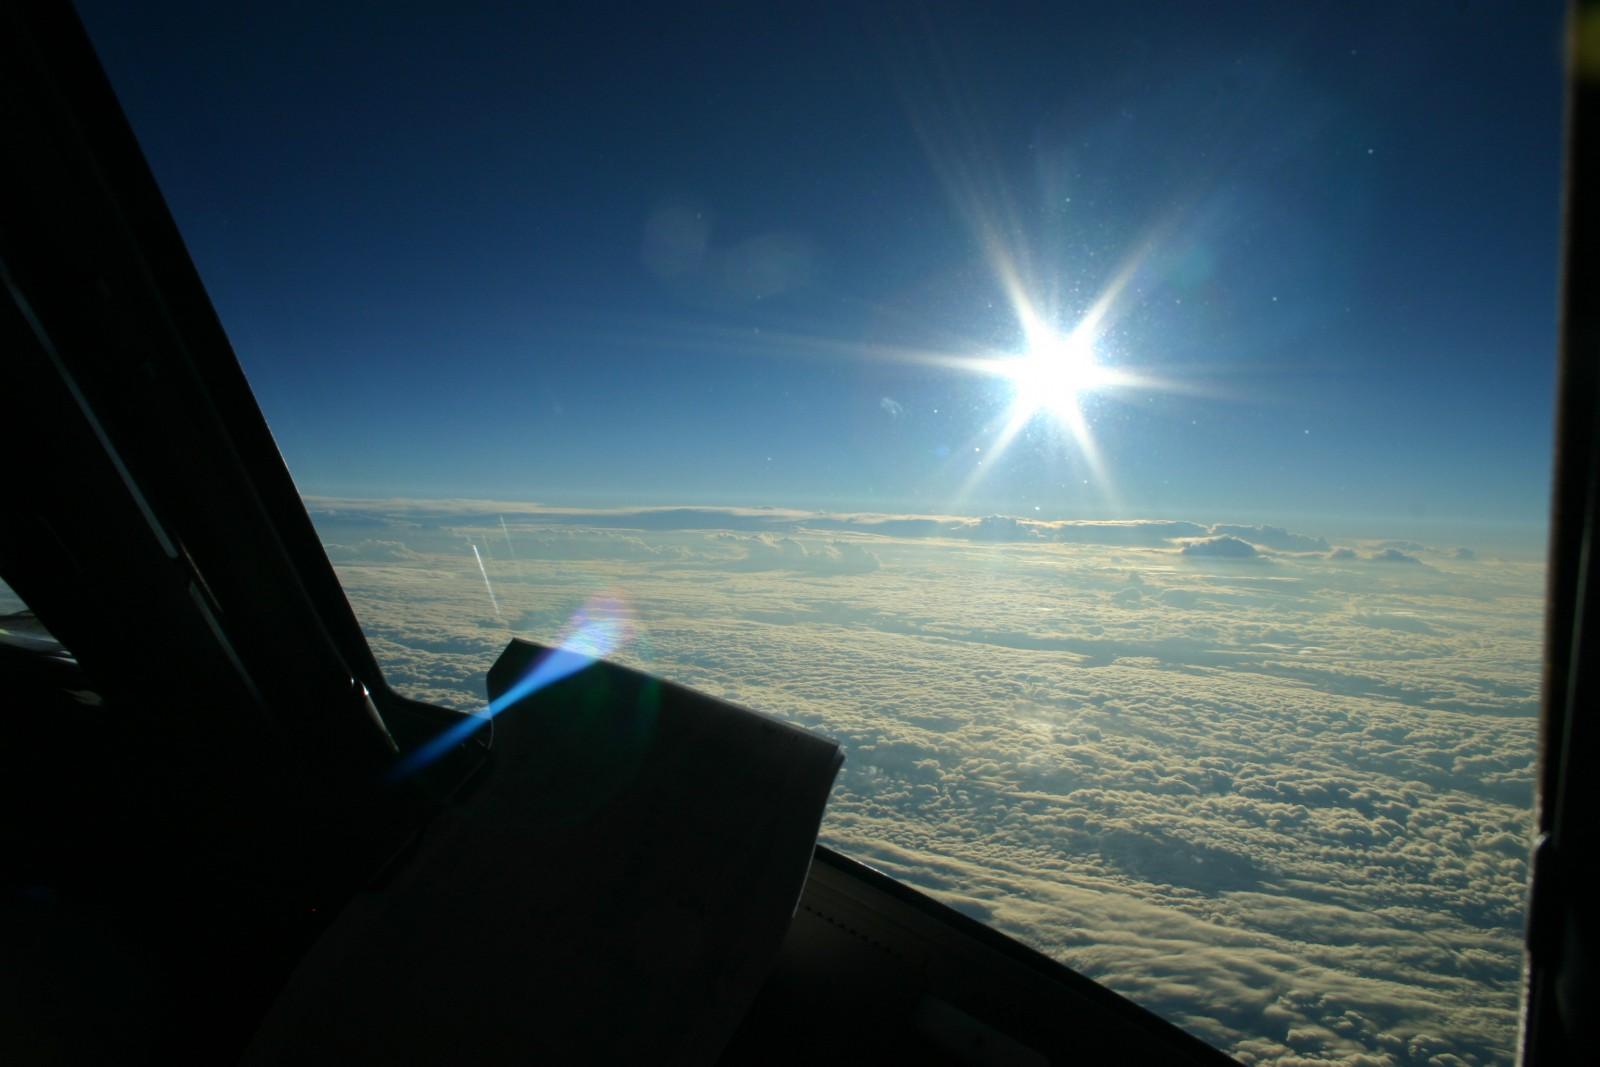 Boeing 777-200LR Double Sunrise record breaking flight